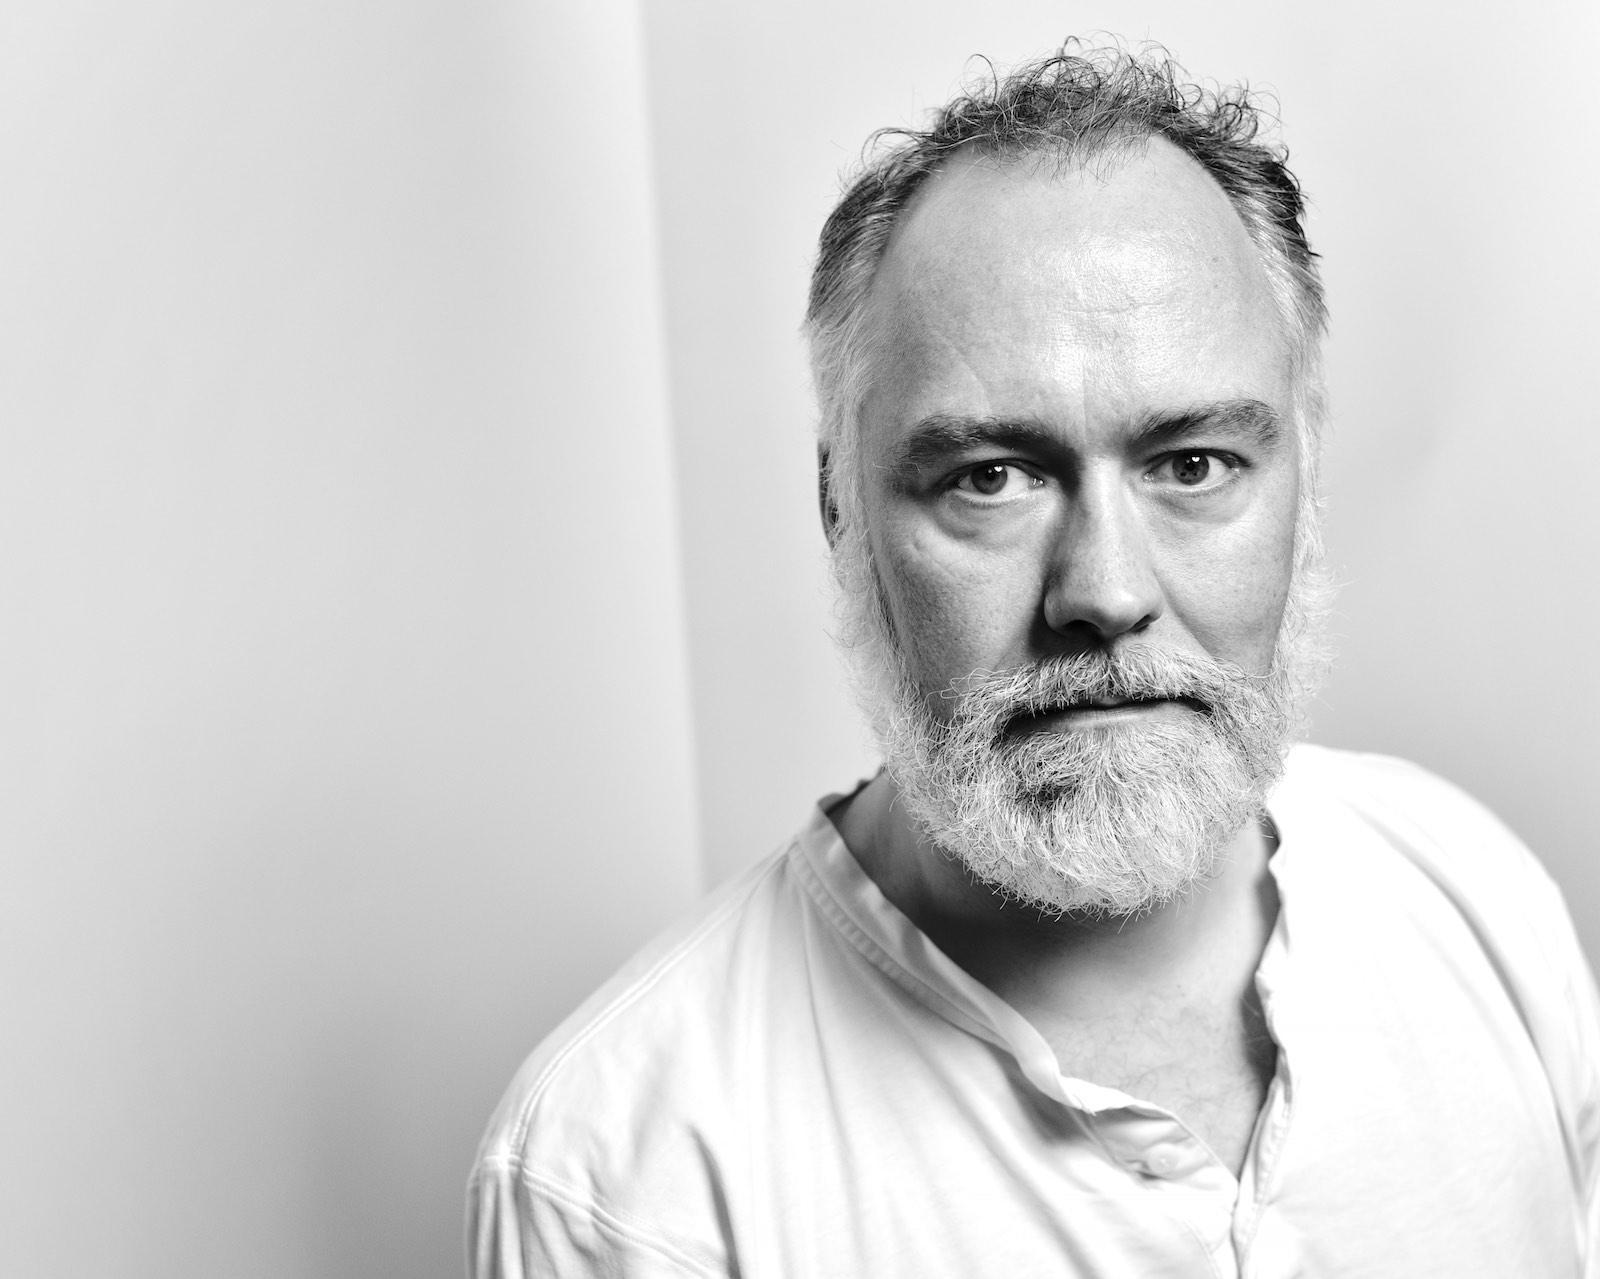 Jörg V. Malotki, Schauspieler